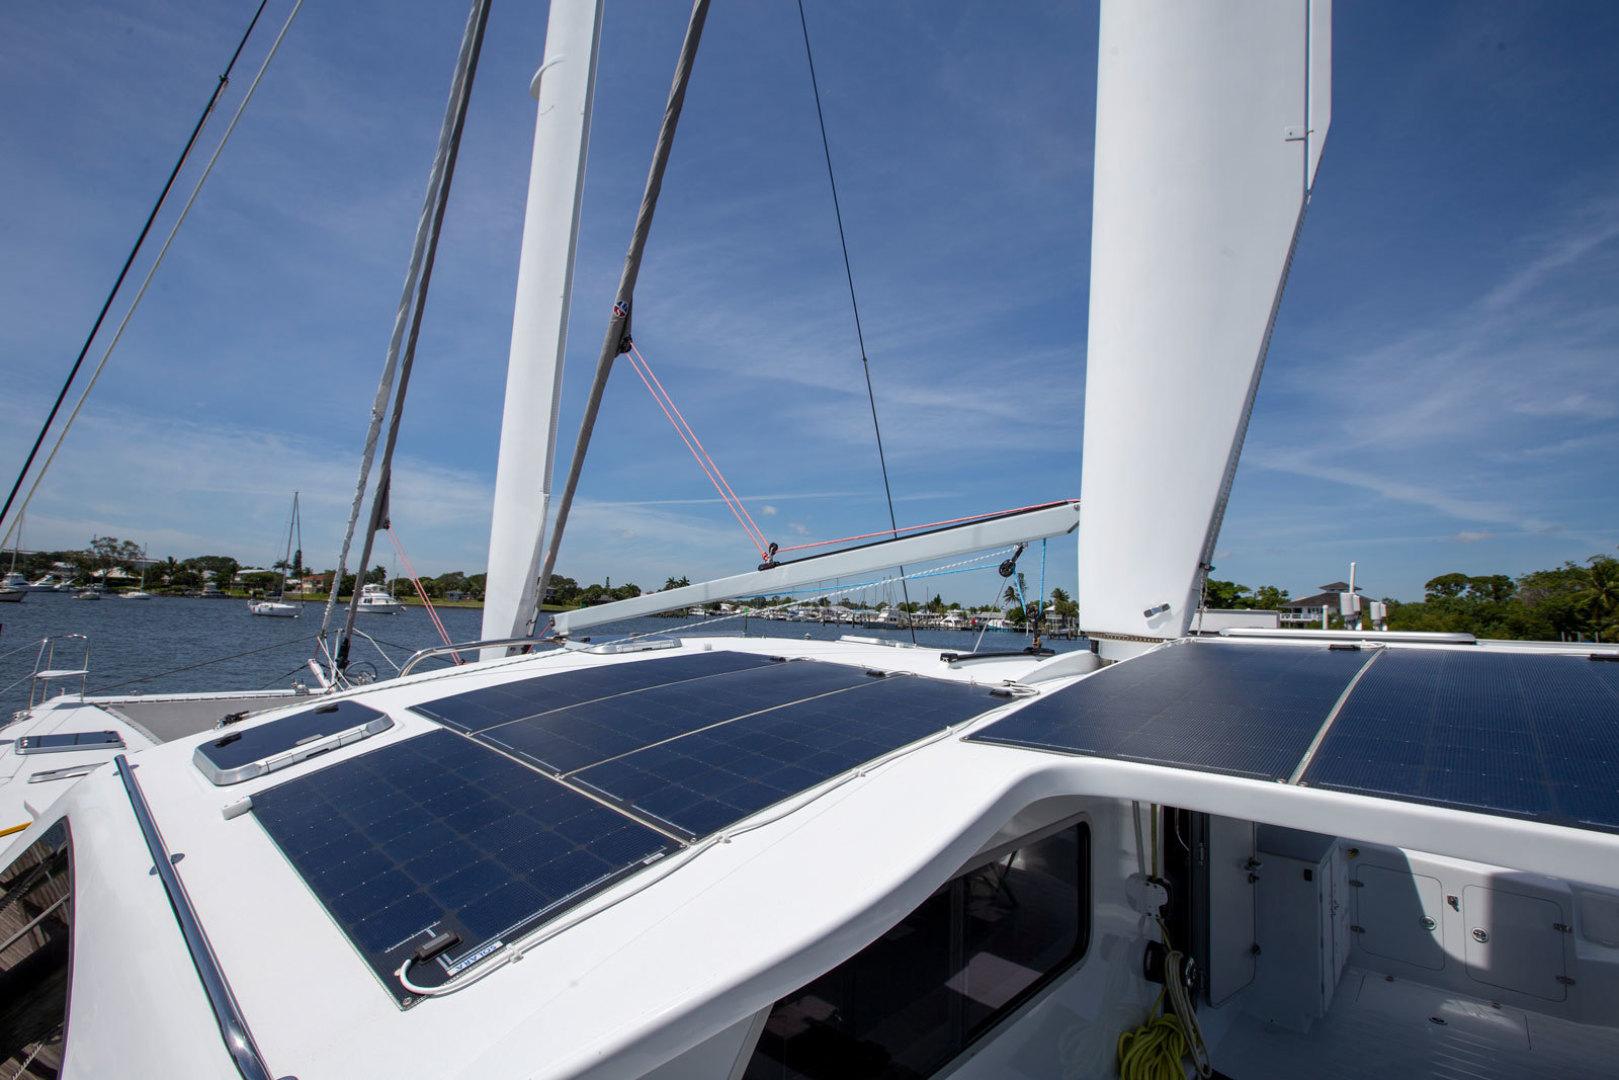 Atlantic-49 Catamaran 2018-Wabi Sabi Stuart-Florida-United States-1399249 | Thumbnail